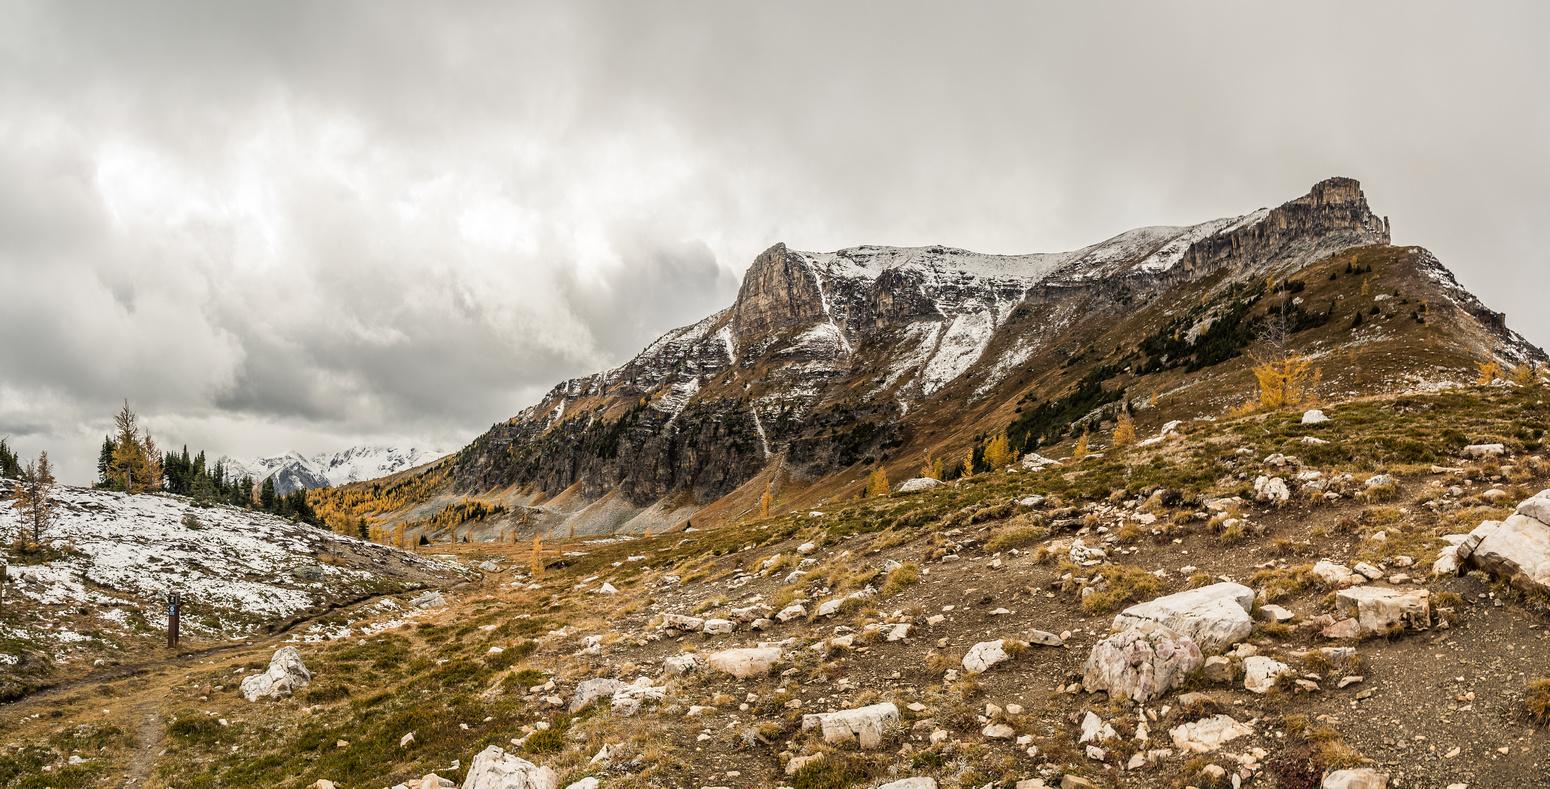 At Citadel Pass with Citadel Peak rising above.